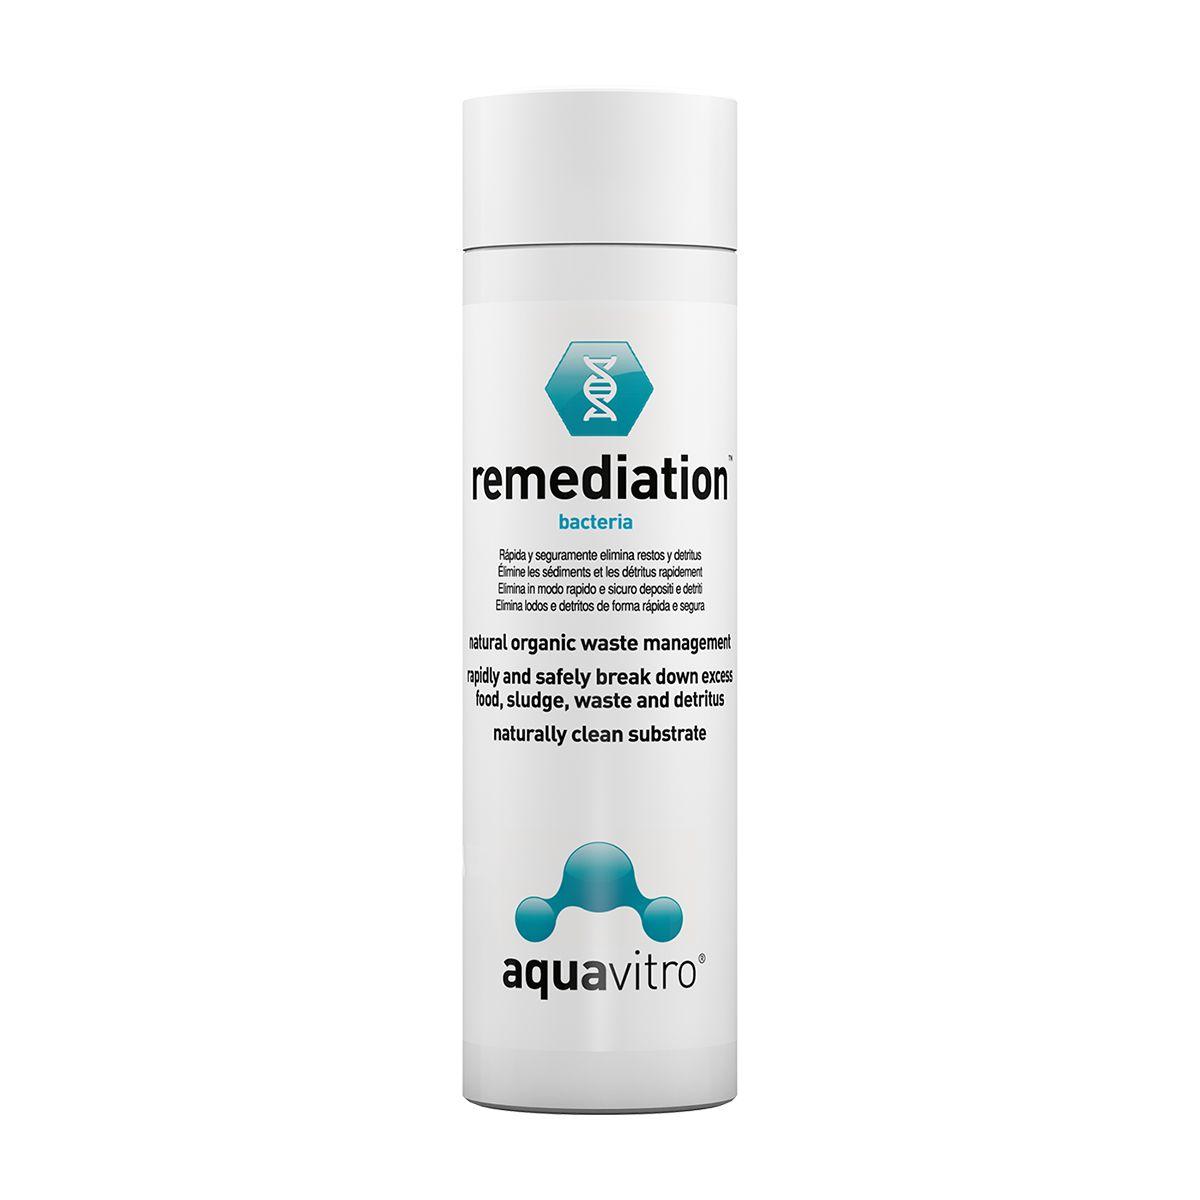 Bactérias Filtrantes Aquavitro Remediation 150ml